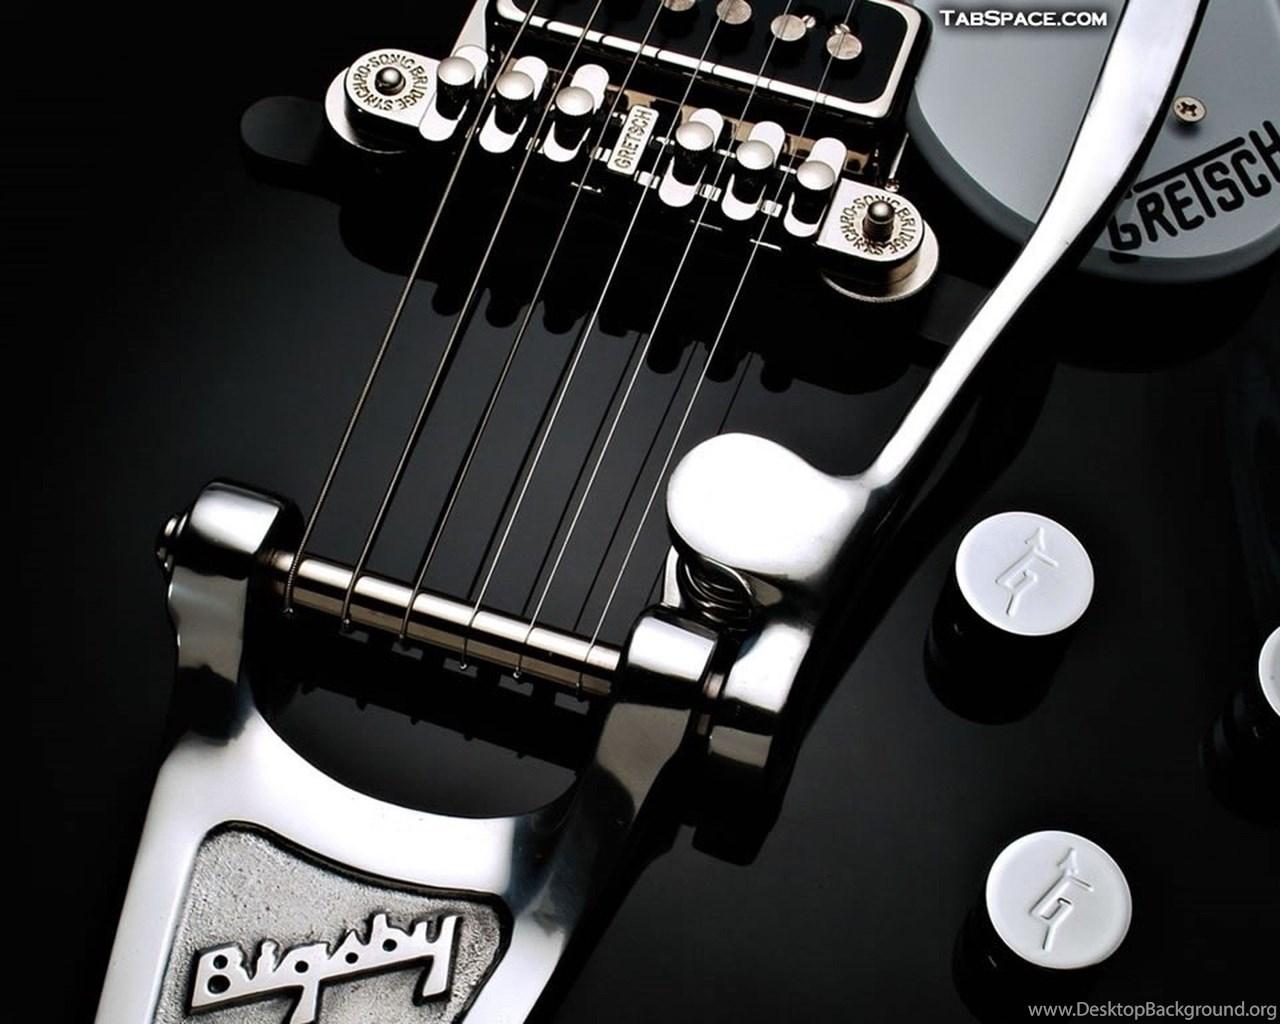 Psonst Ibanez Bass Guitar Wallpaper Images Desktop Background